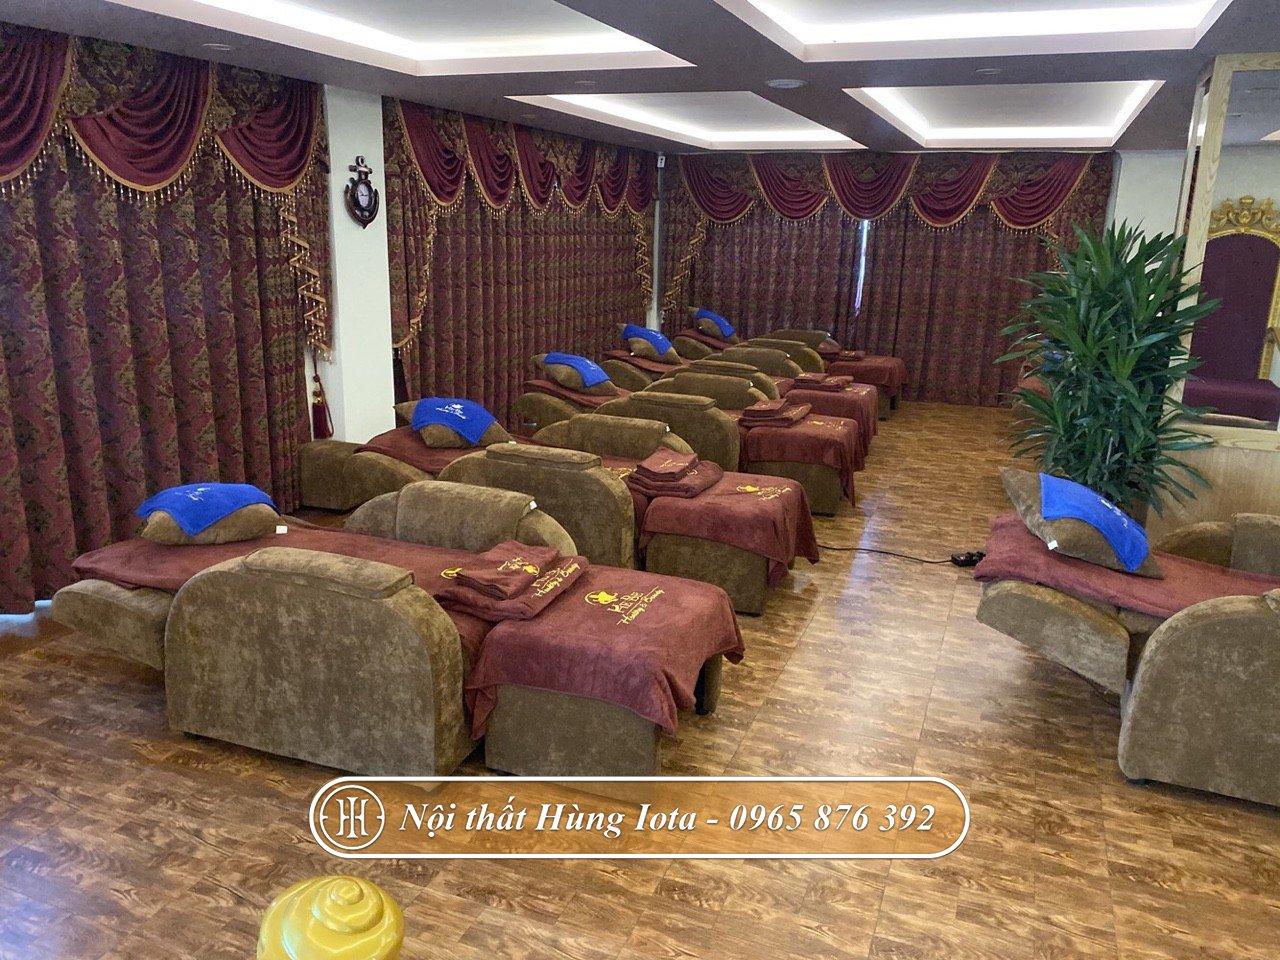 Ghế foot massage khung gỗ sồi chắc chắn